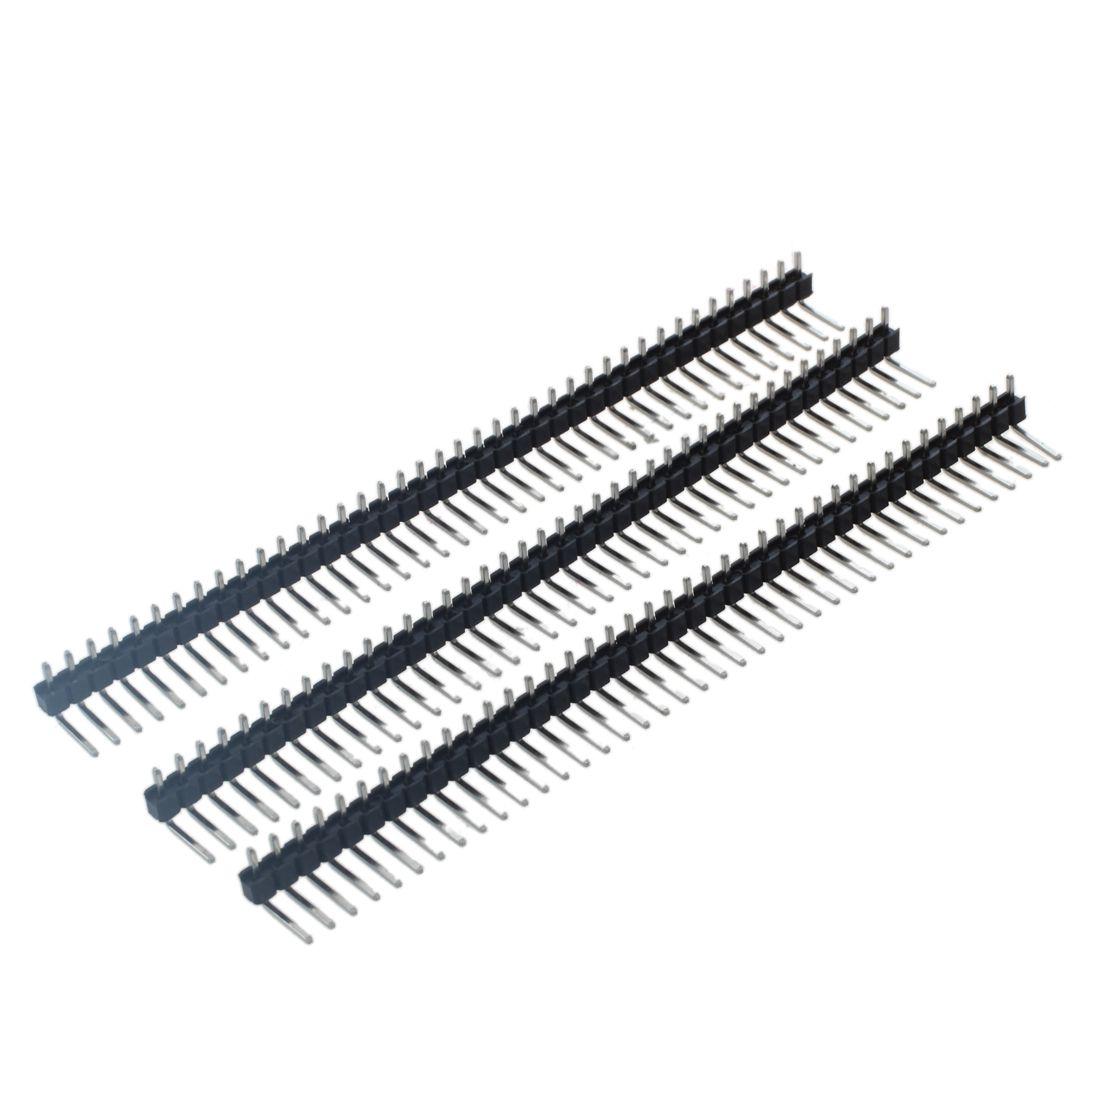 3 Pcs 40 Pins 2 54mm Pitch Right Angle Pcb Board Pin